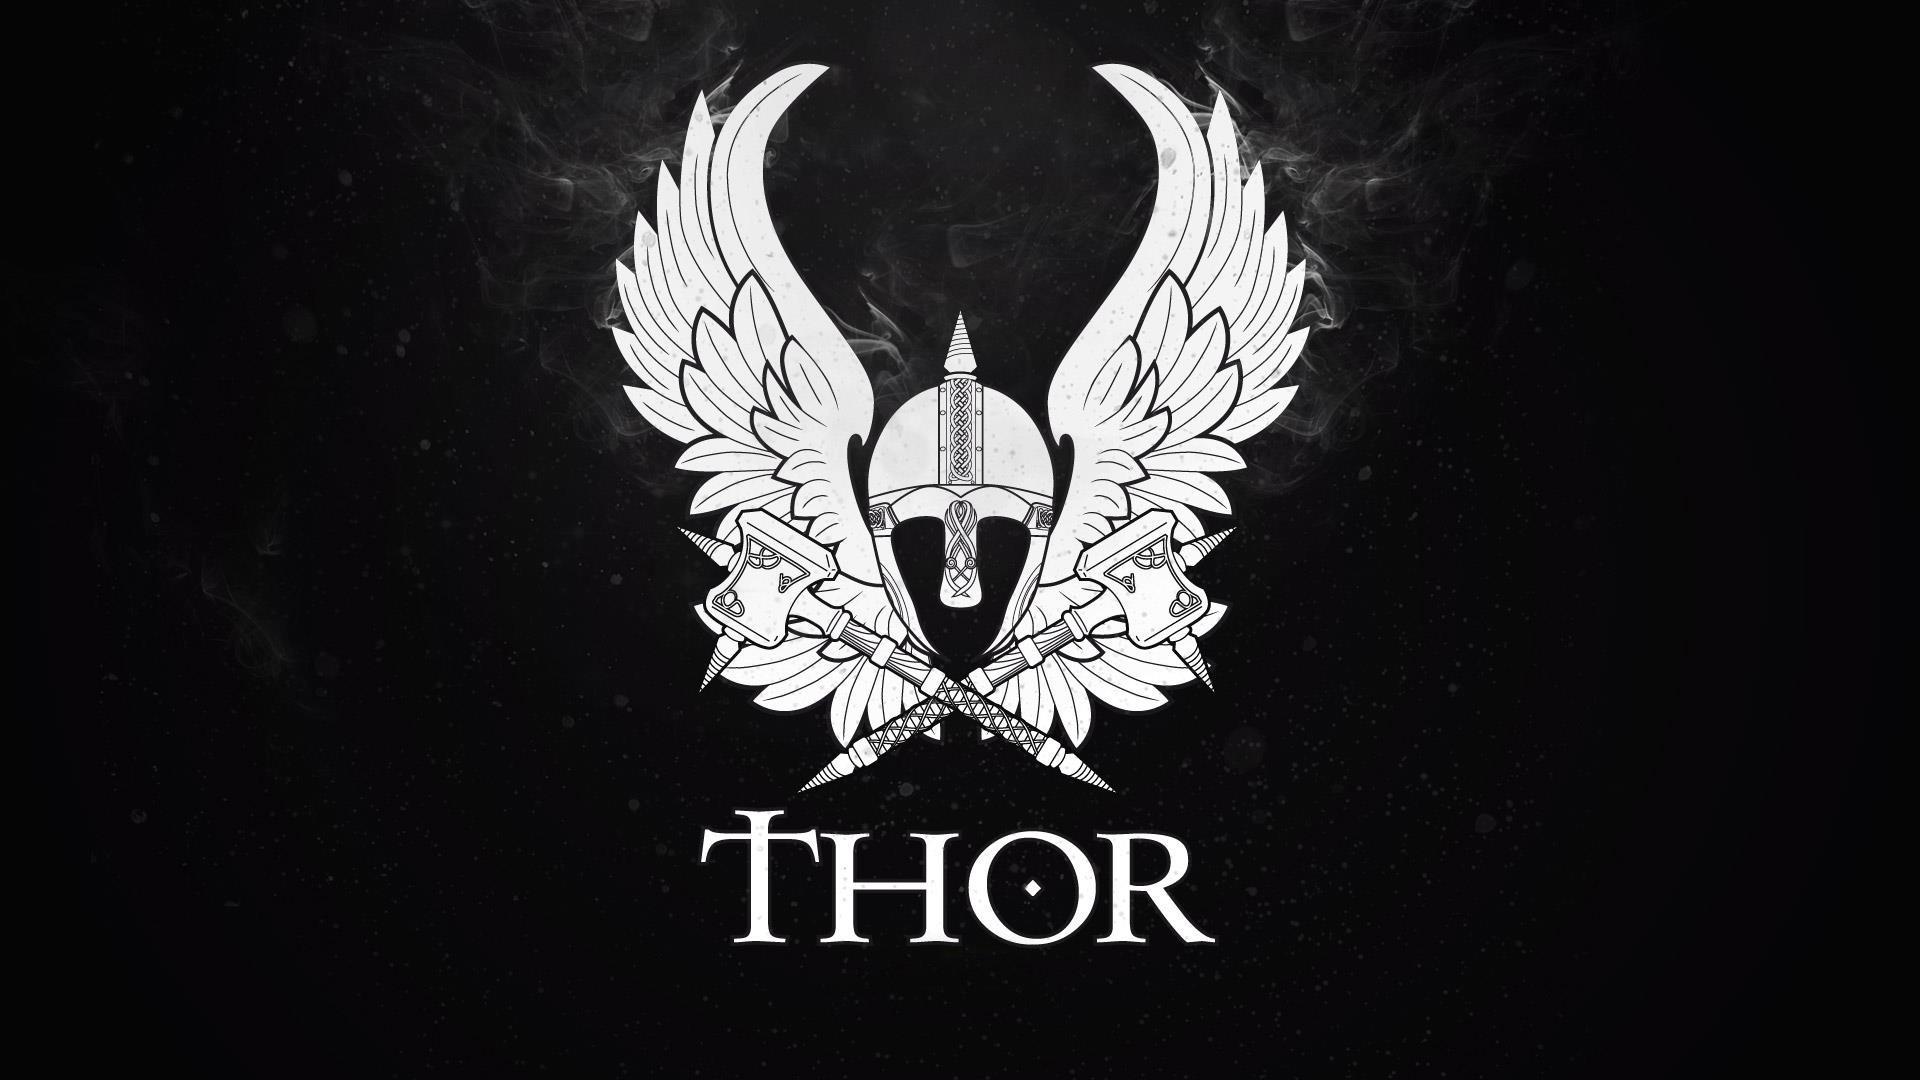 3d Thor Ragnarok Android Wallpaper 40 Free Thor Wallpaper Hd For Desktop